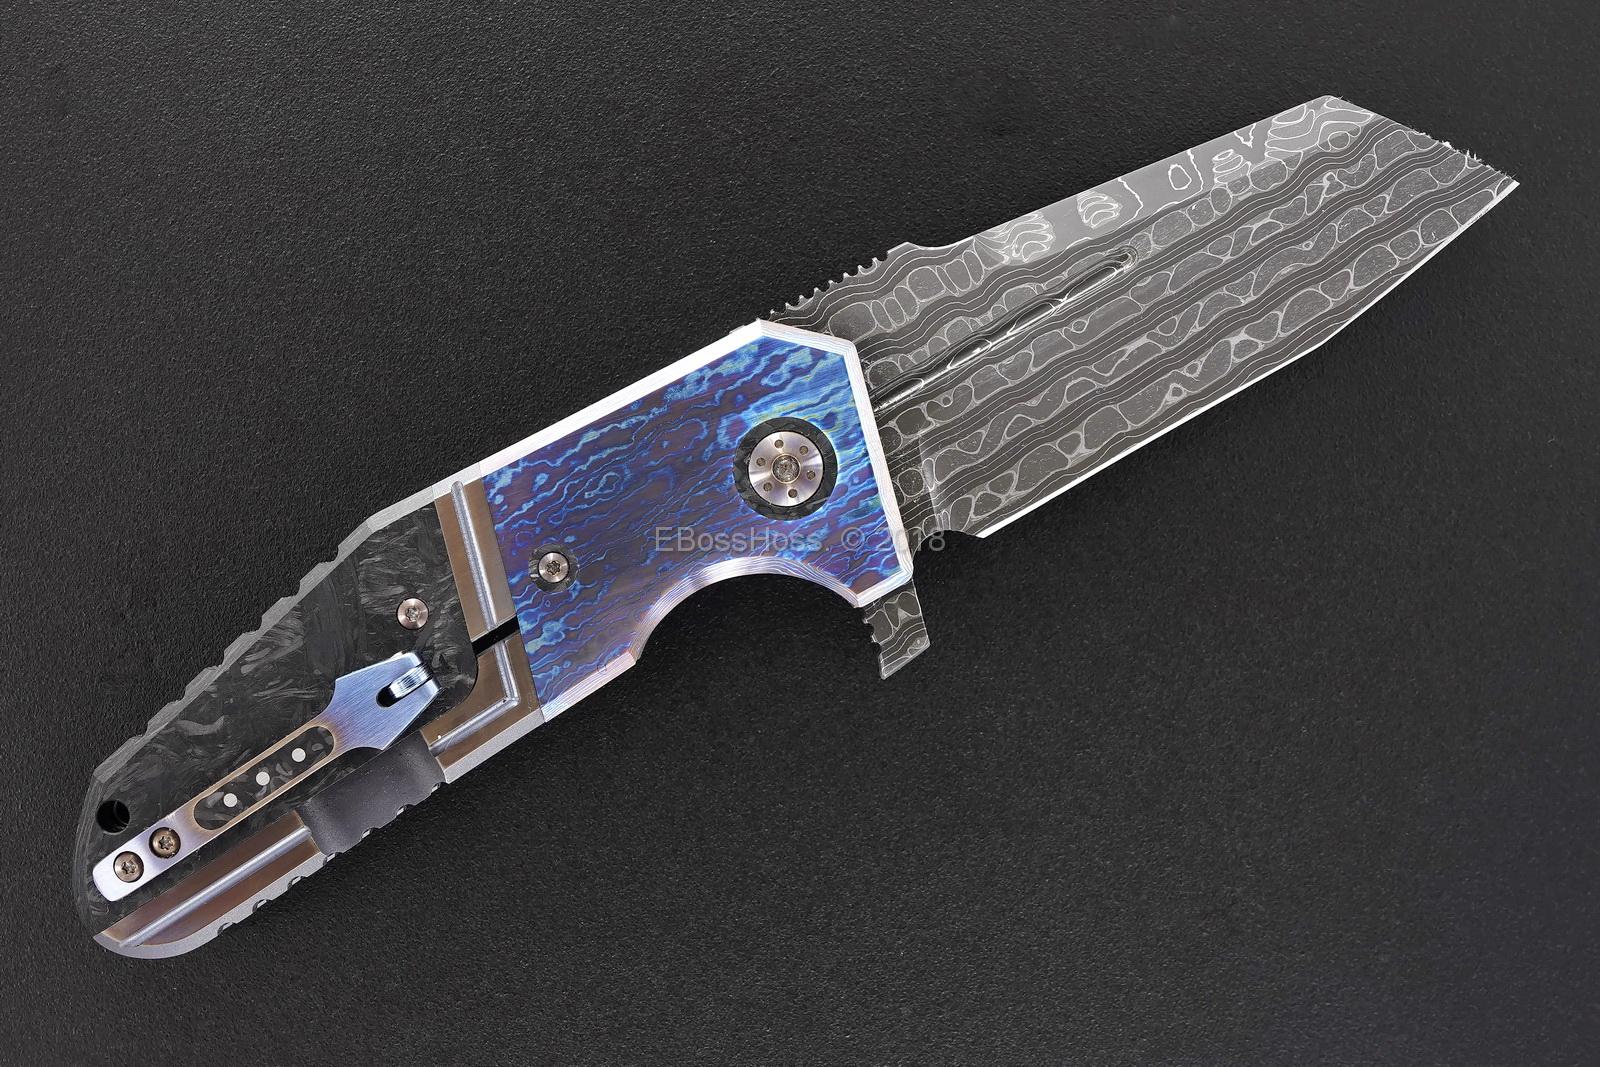 Shane Sibert Custom Very Deluxe Bolsterlock Pocket Rocket Flipper